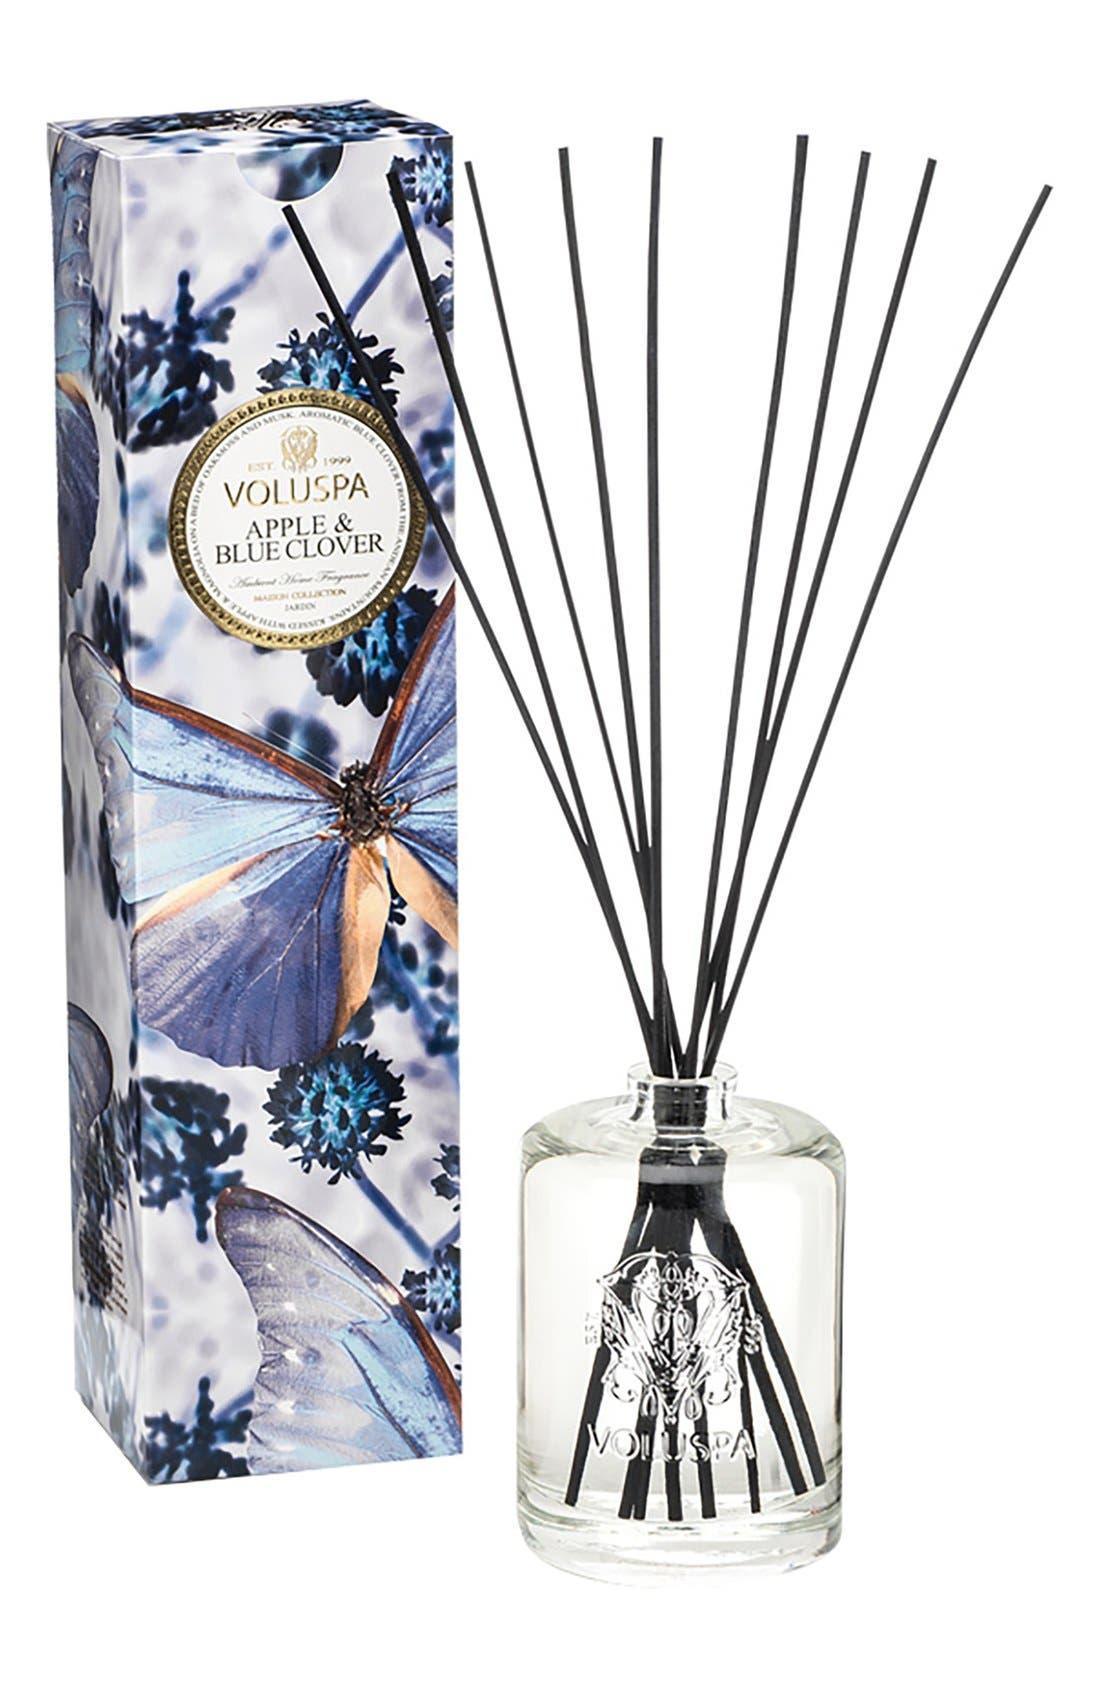 Maison Jardin Apple & Blue Clover Fragrant Oil Diffuser,                             Main thumbnail 1, color,                             Apple Blue Clover